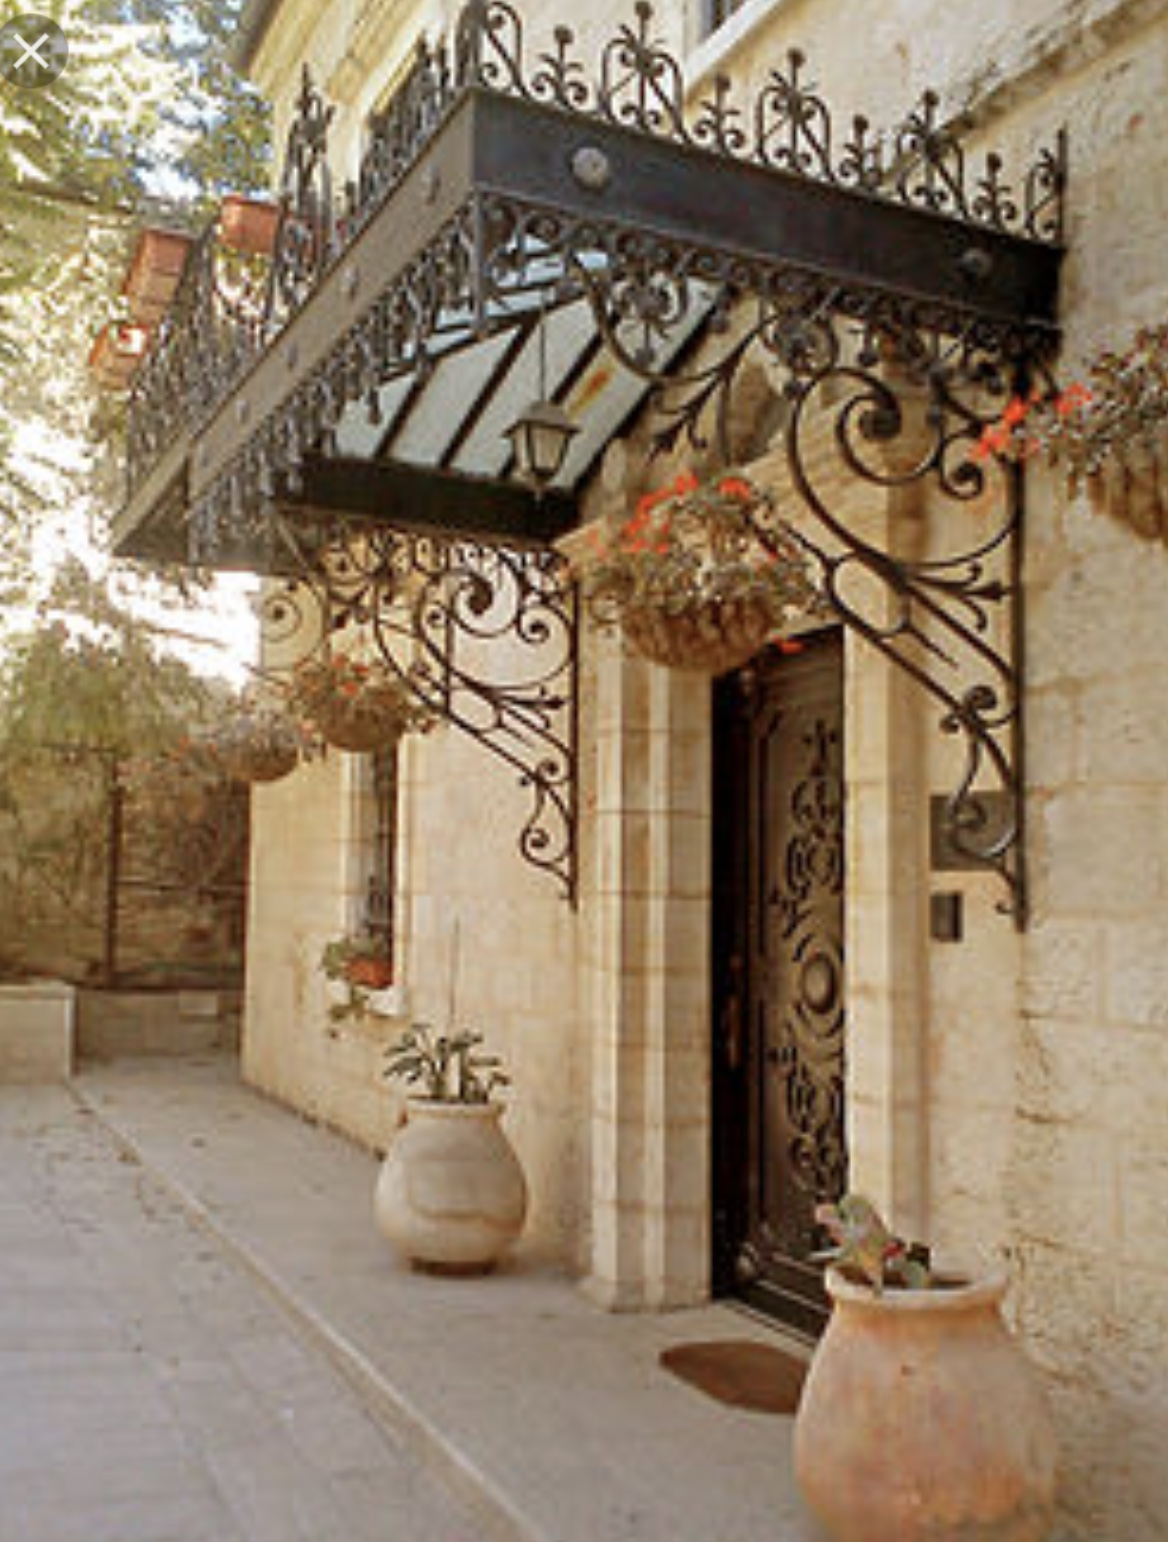 Rebbe El on Travel and Israel Blog  Parashat Tzav – Shabbat HaGadol